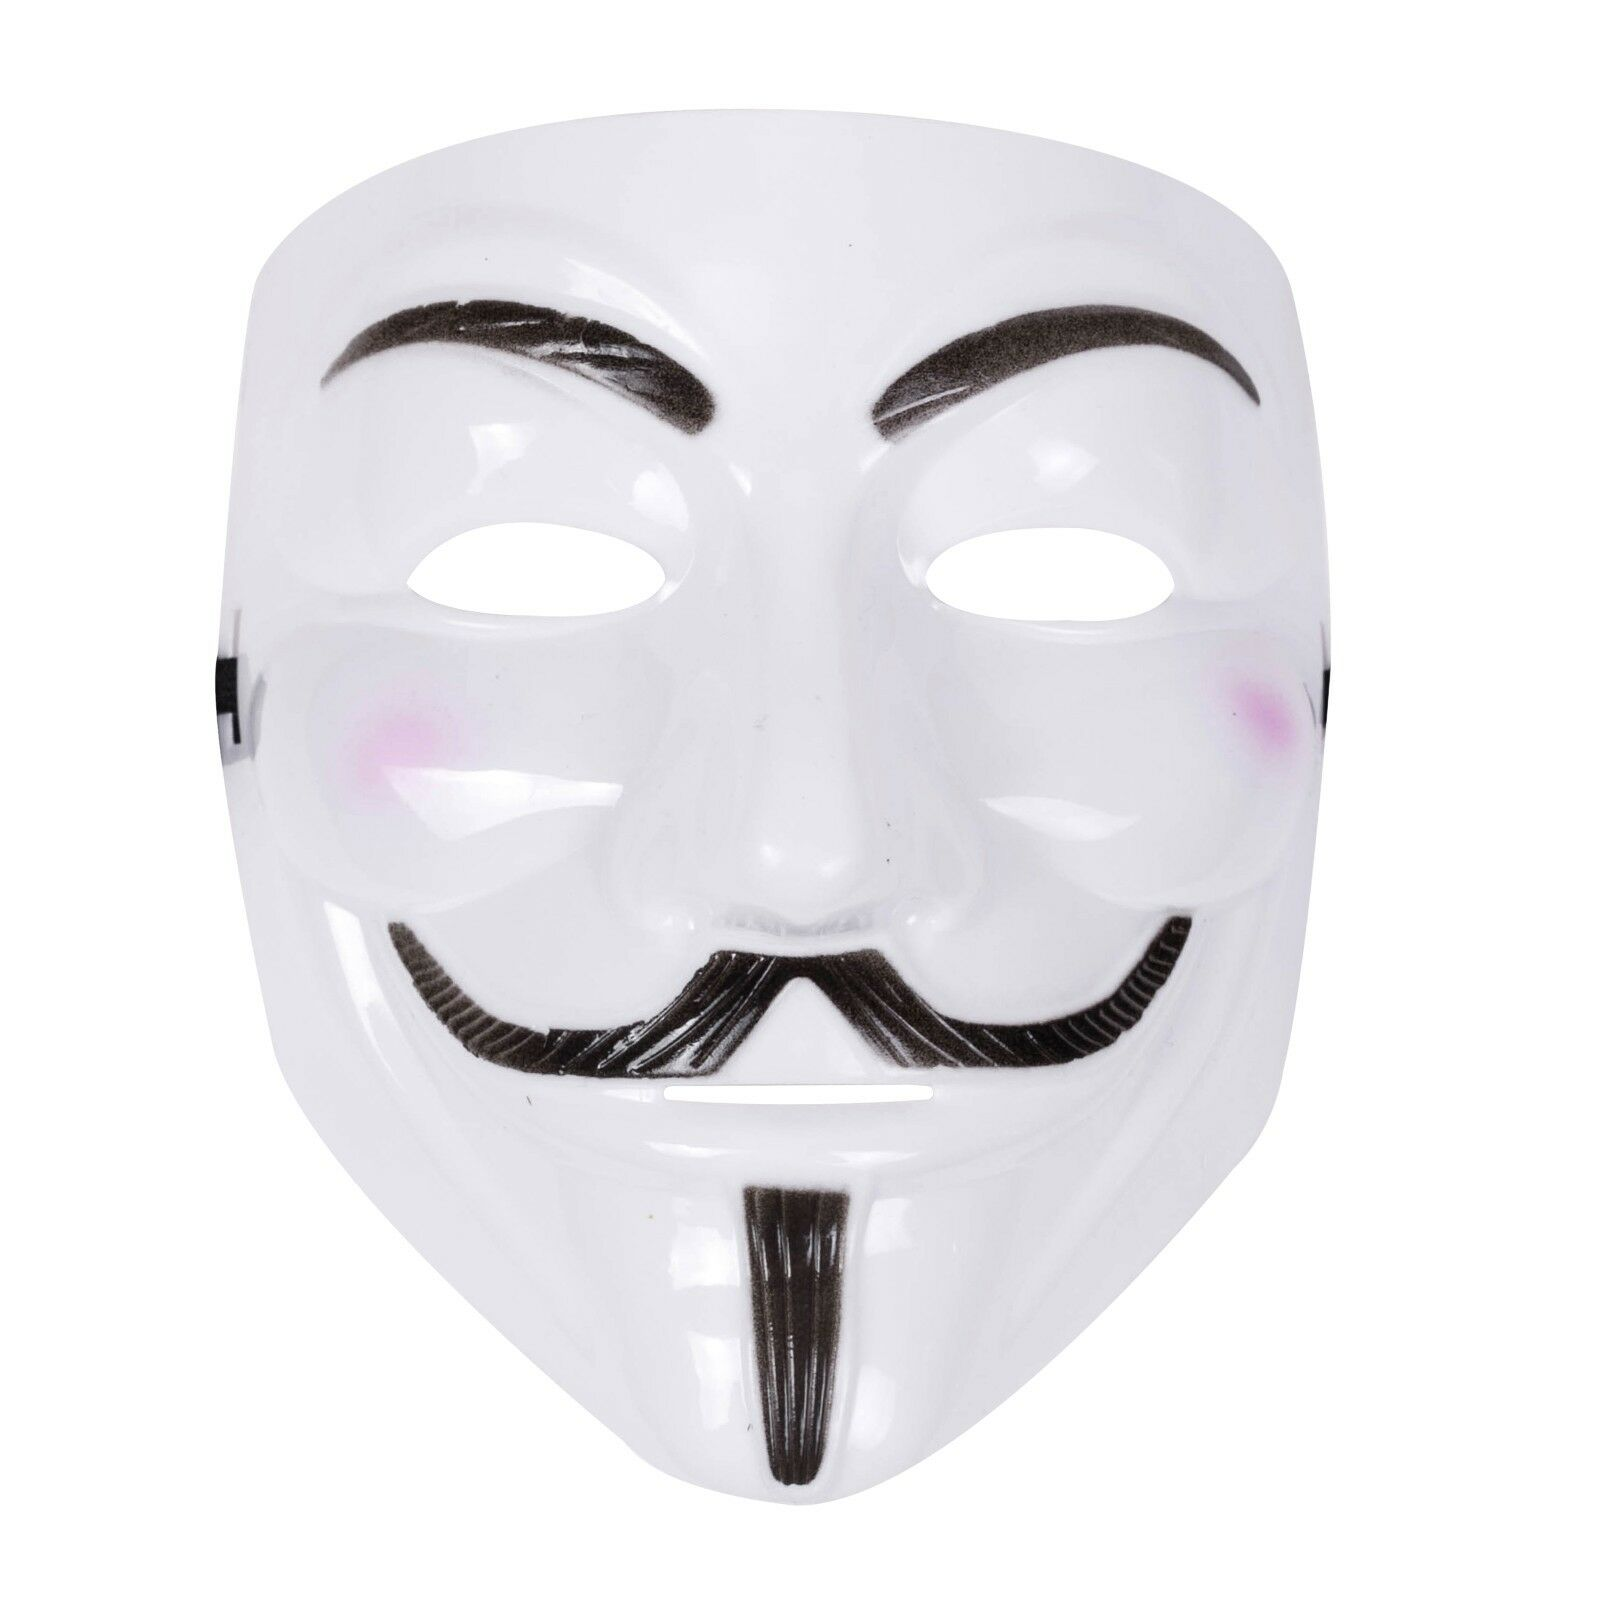 Unisex Anonymous Guy Fawkes Mask 1605 Gunpowder Plot Halloween Fancy Dress Masks